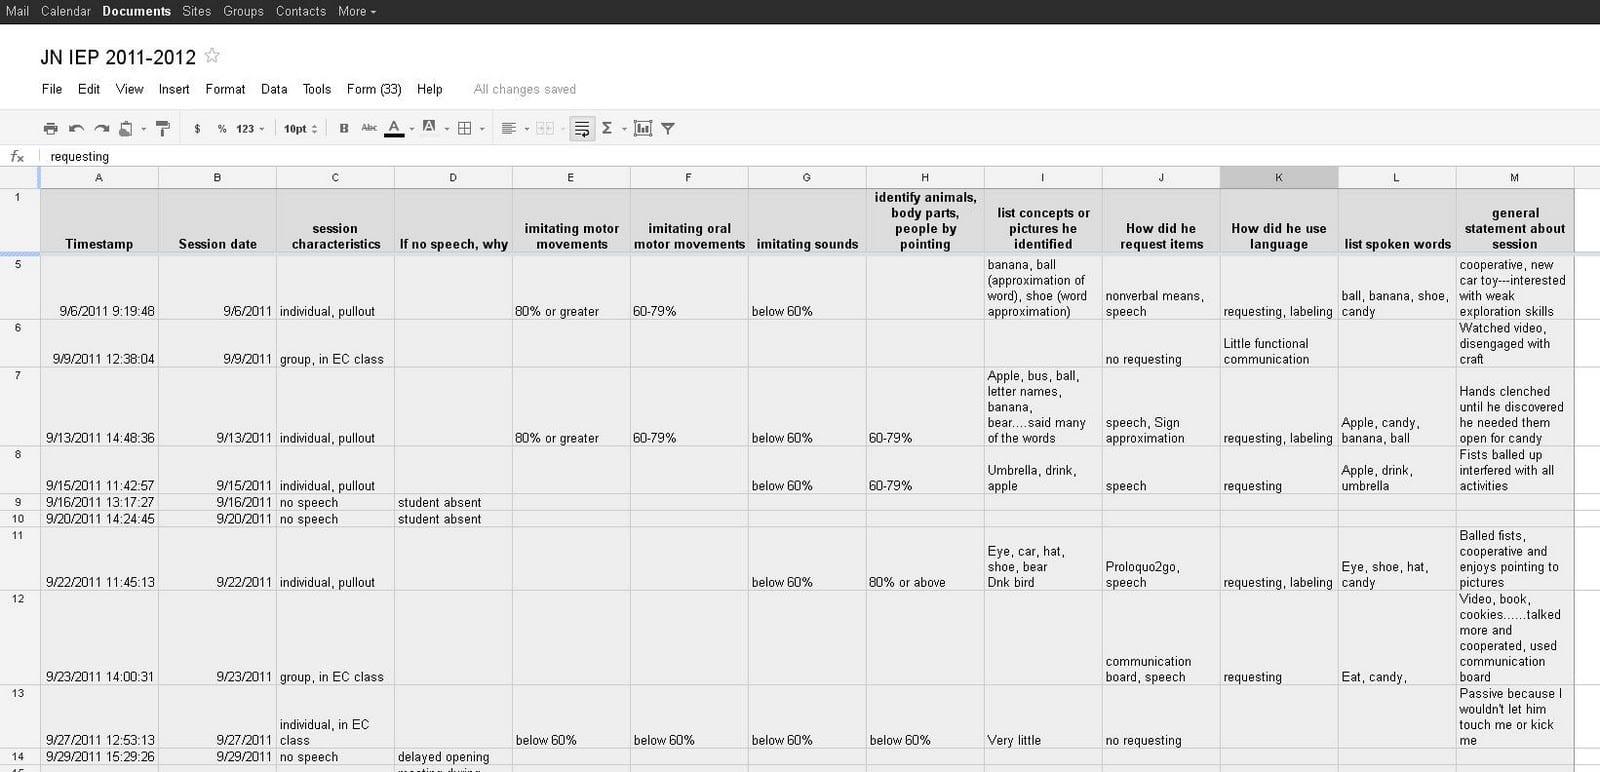 Inventory Spreadsheet Template Data Spreadsheet Template Spreadsheet Templates for Business Data Spreadshee Spreadsheet Templates for Business Data Spreadshee Inventory Spreadsheet Template